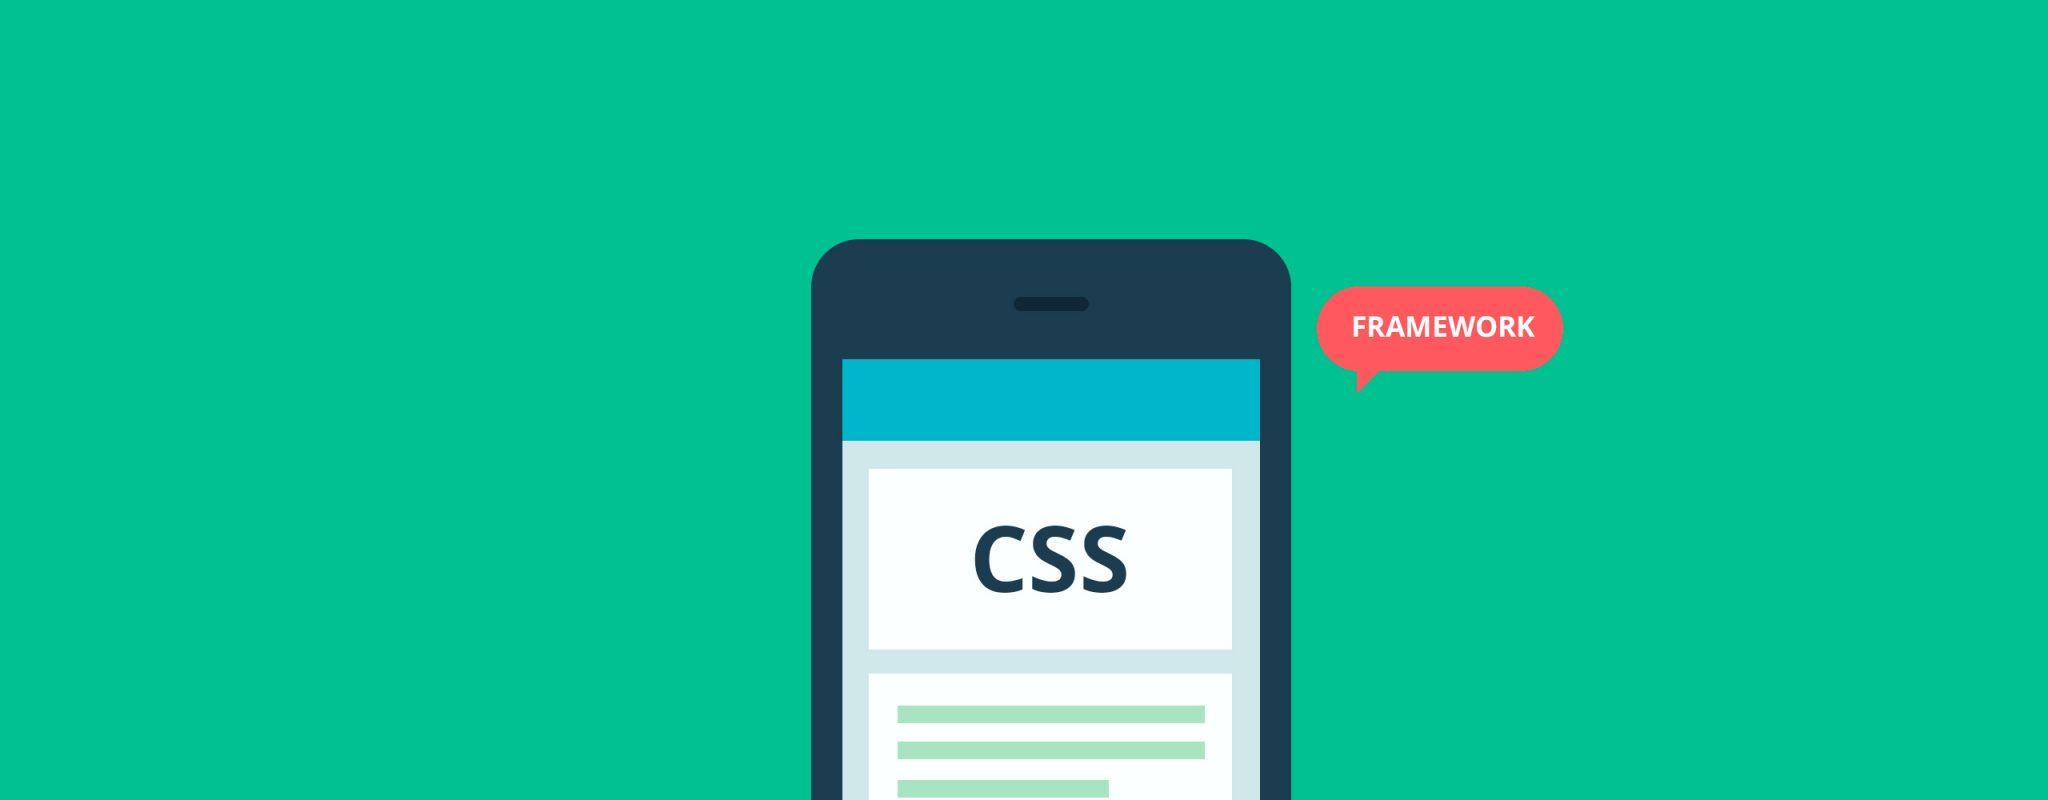 2017 css framework